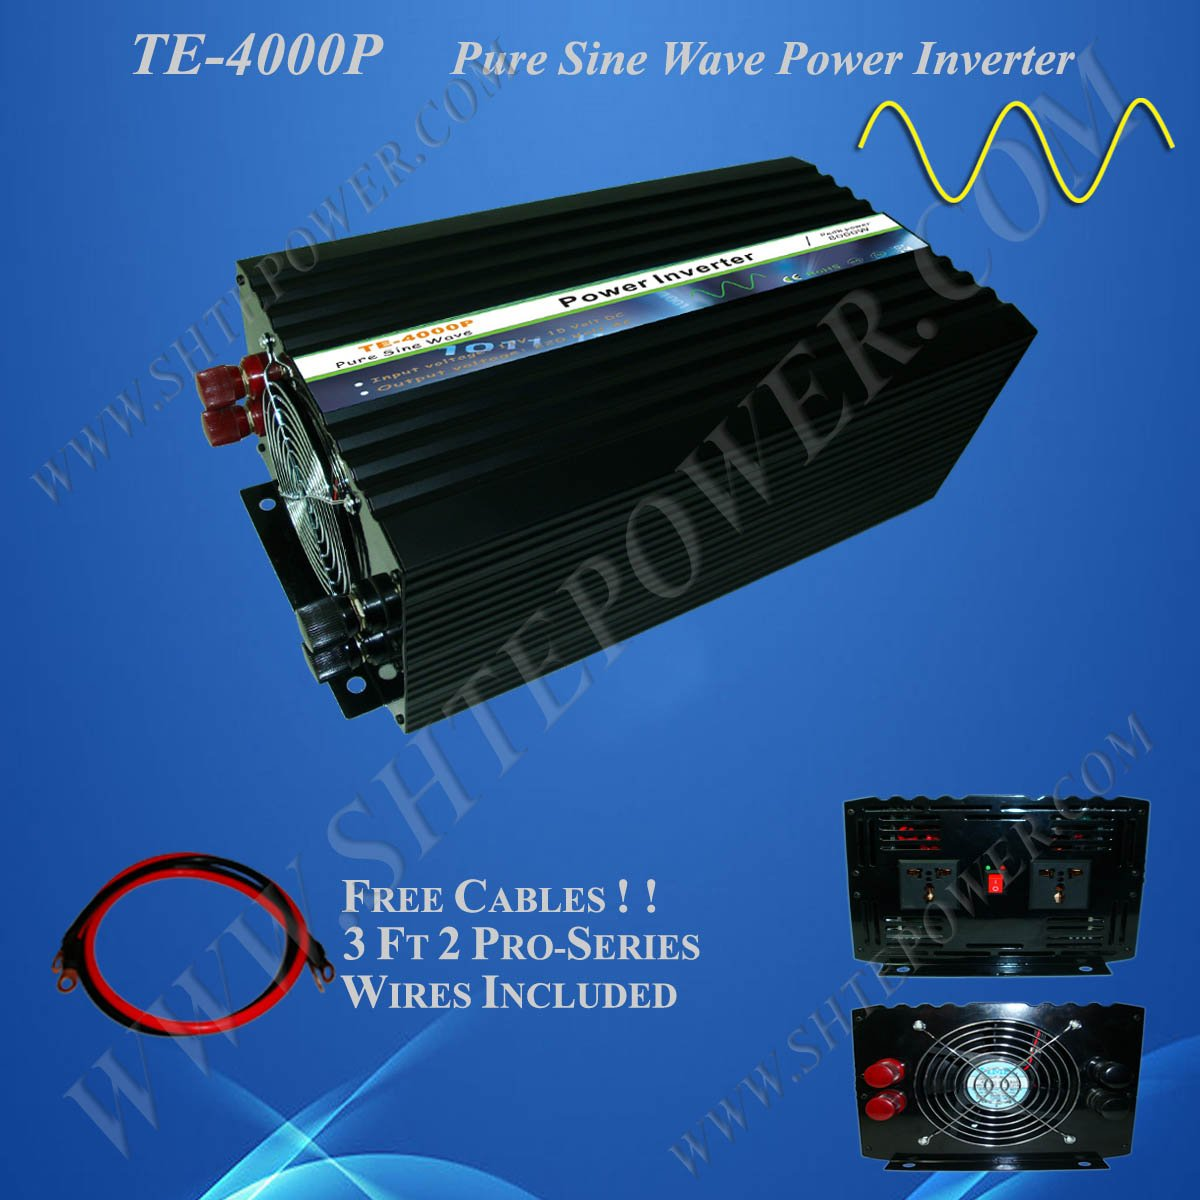 pure sine wave inverter 4000w dc ac inverter manufacturers 12v 120v 4kwpure sine wave inverter 4000w dc ac inverter manufacturers 12v 120v 4kw